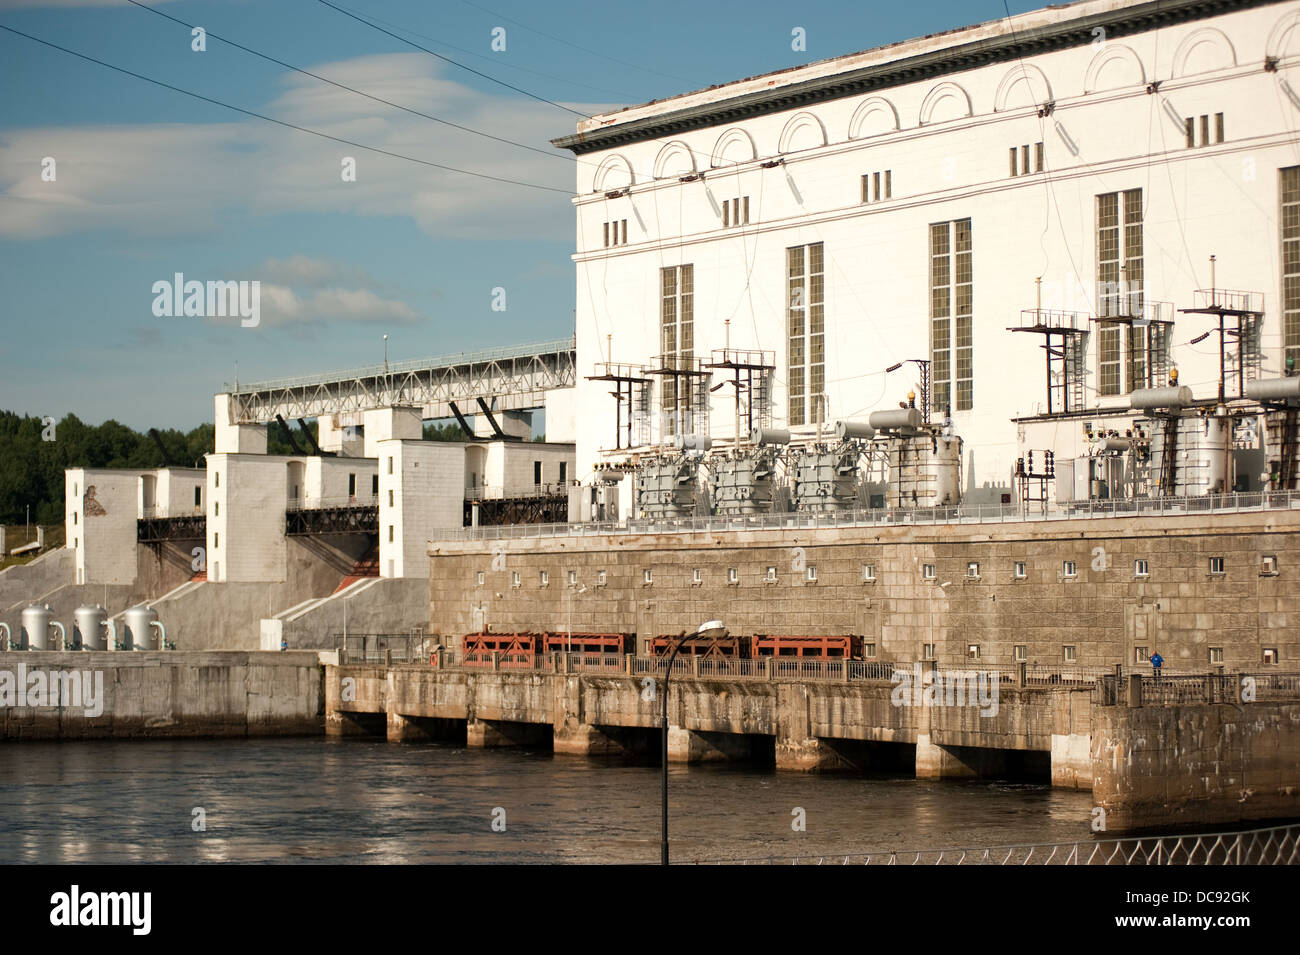 Hydro power plant on Svir River Volga-Baltic Waterway Russia - Stock Image